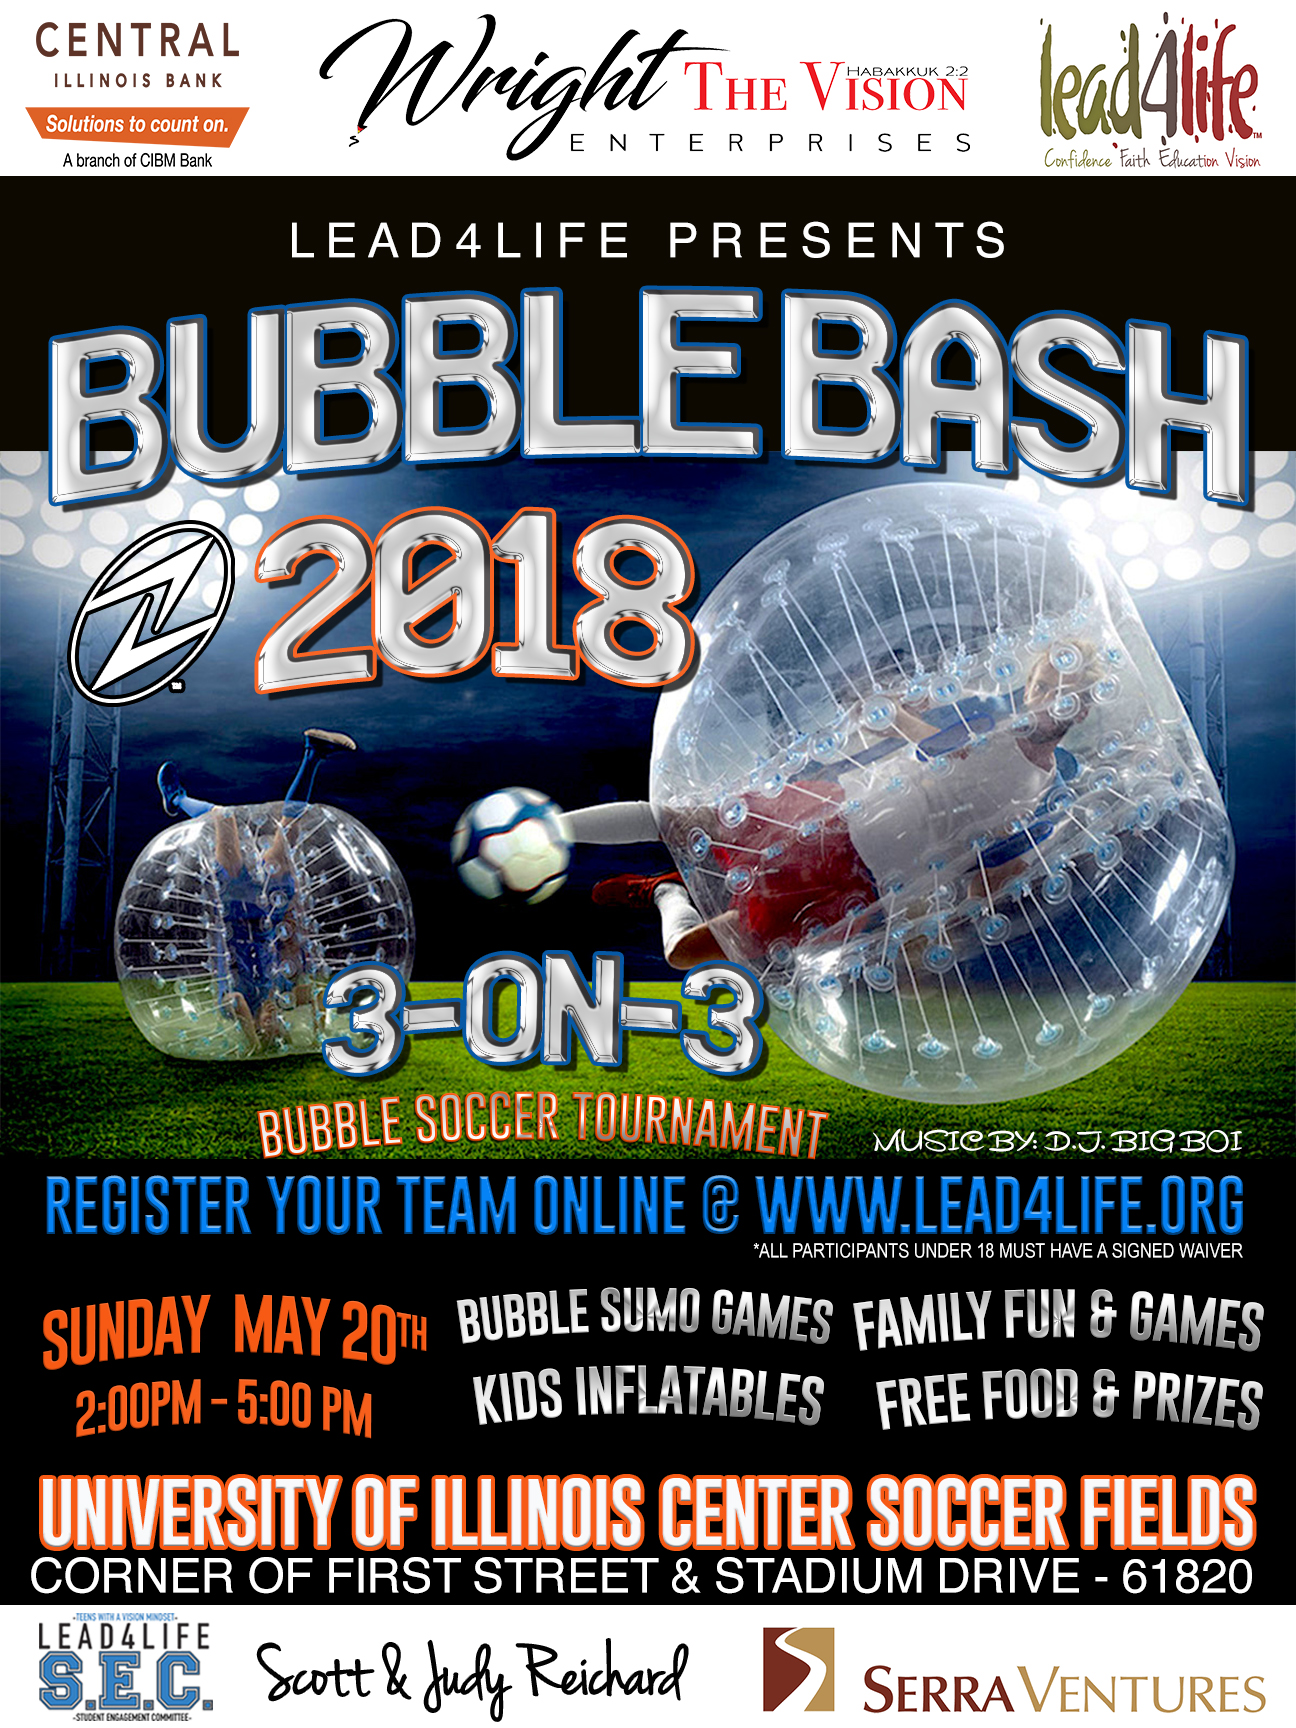 Bubble Bash Poster copy.jpg